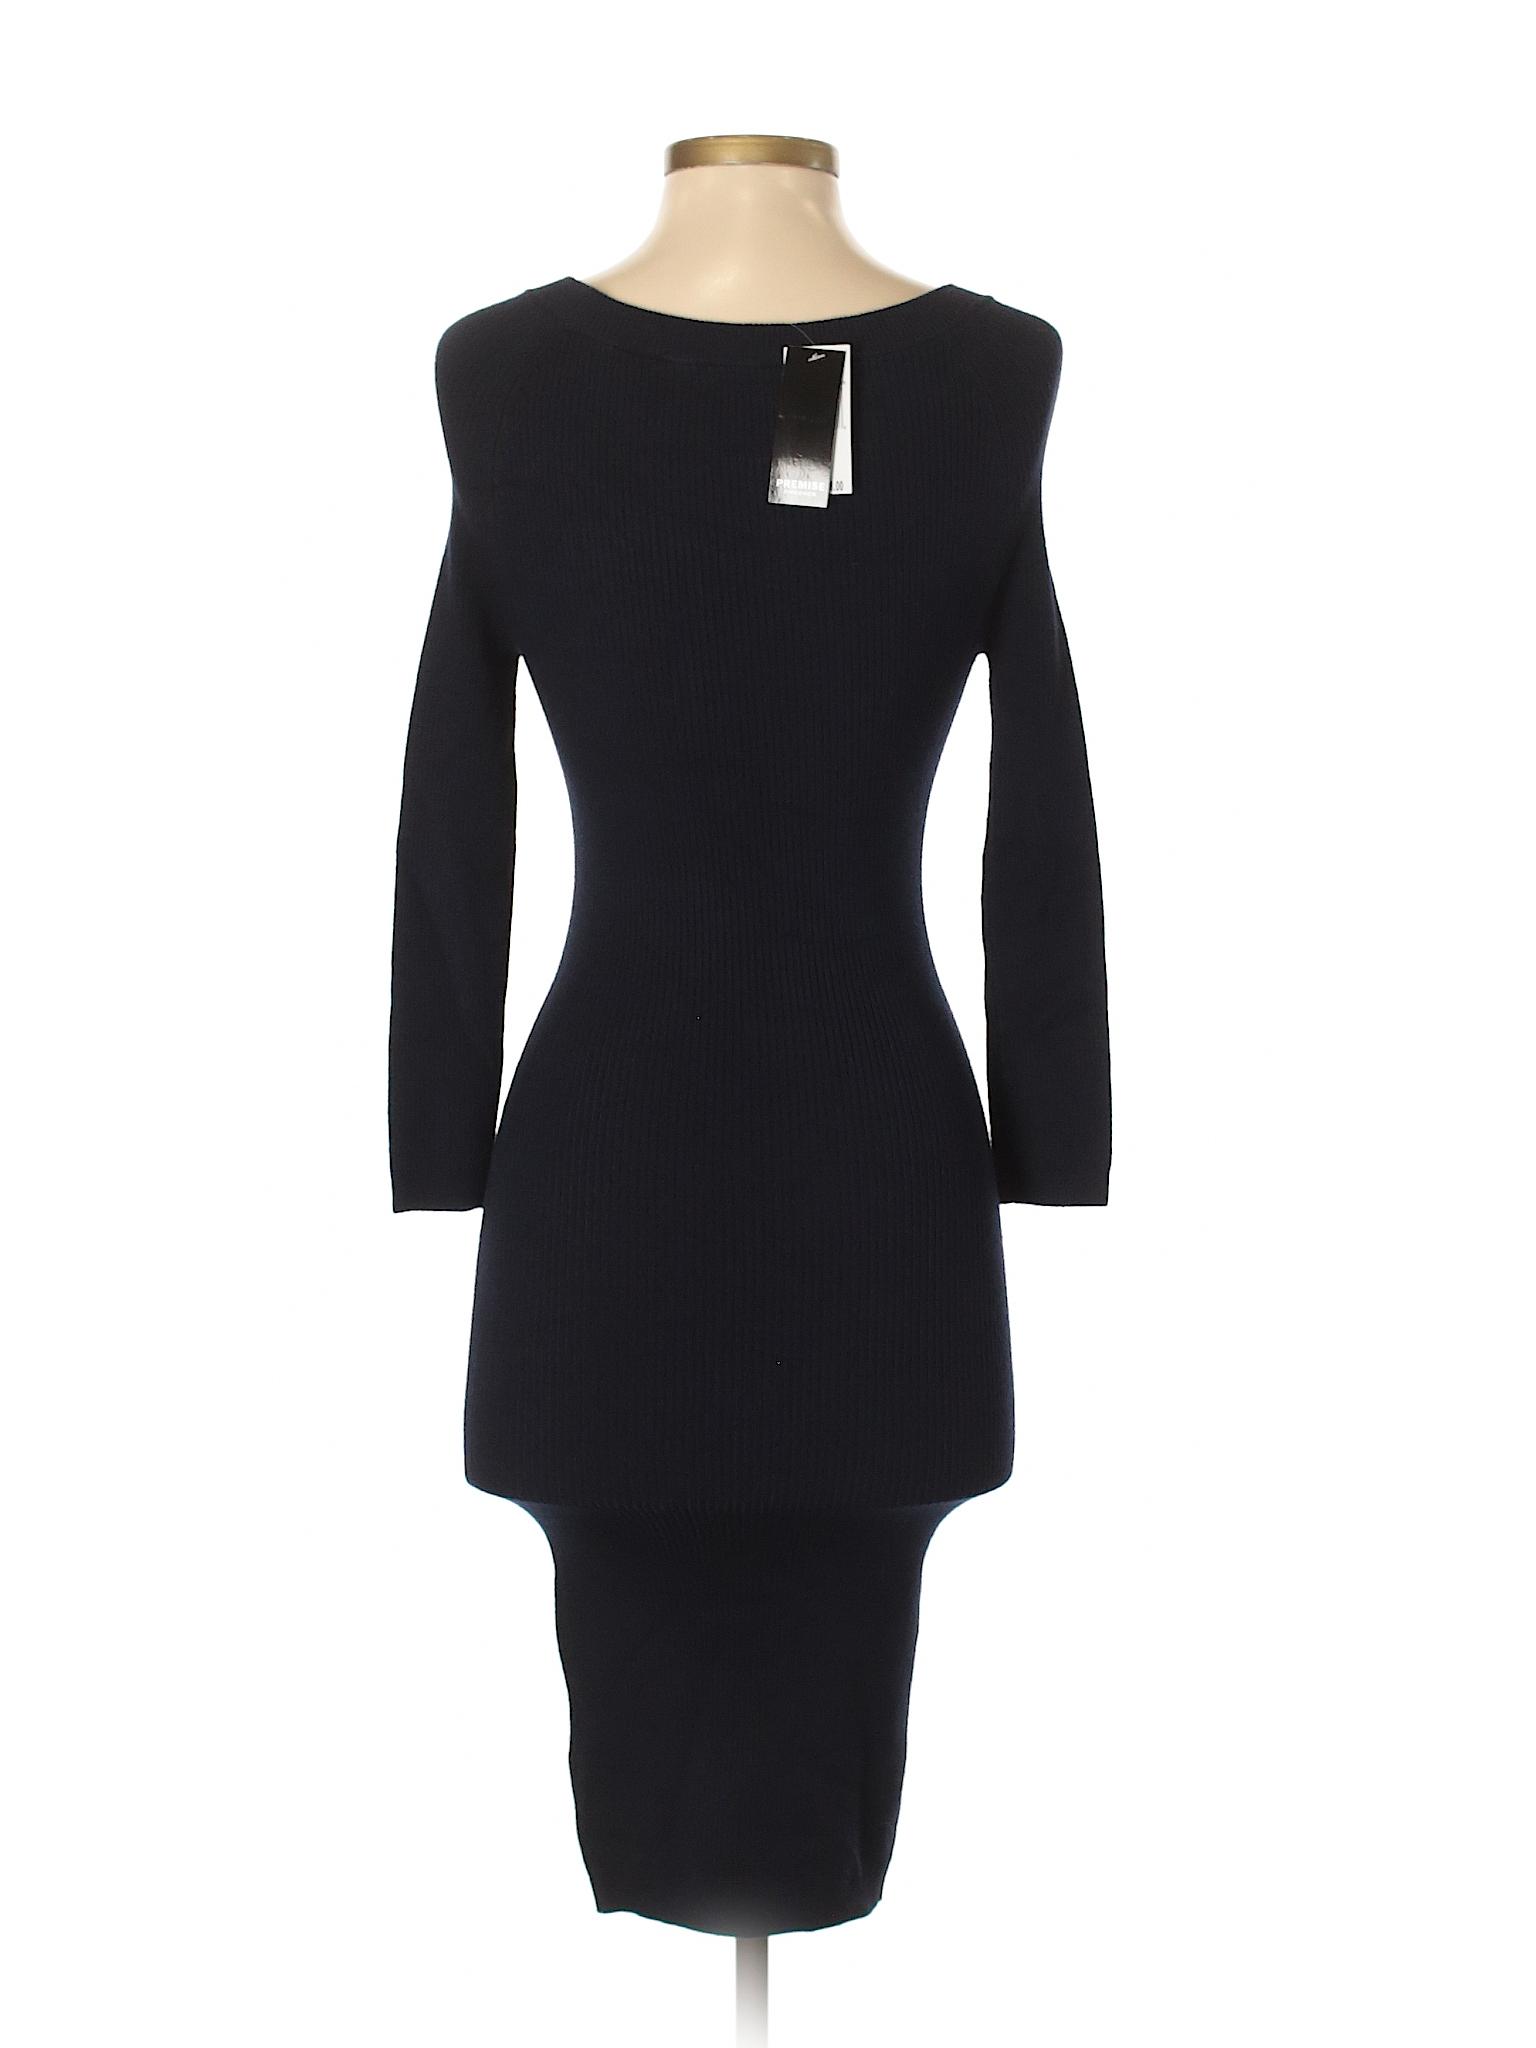 Dress Selling Casual Dress Casual PREMISE Selling Selling PREMISE PREMISE Casual Selling Dress PREMISE UgwgxA5qH